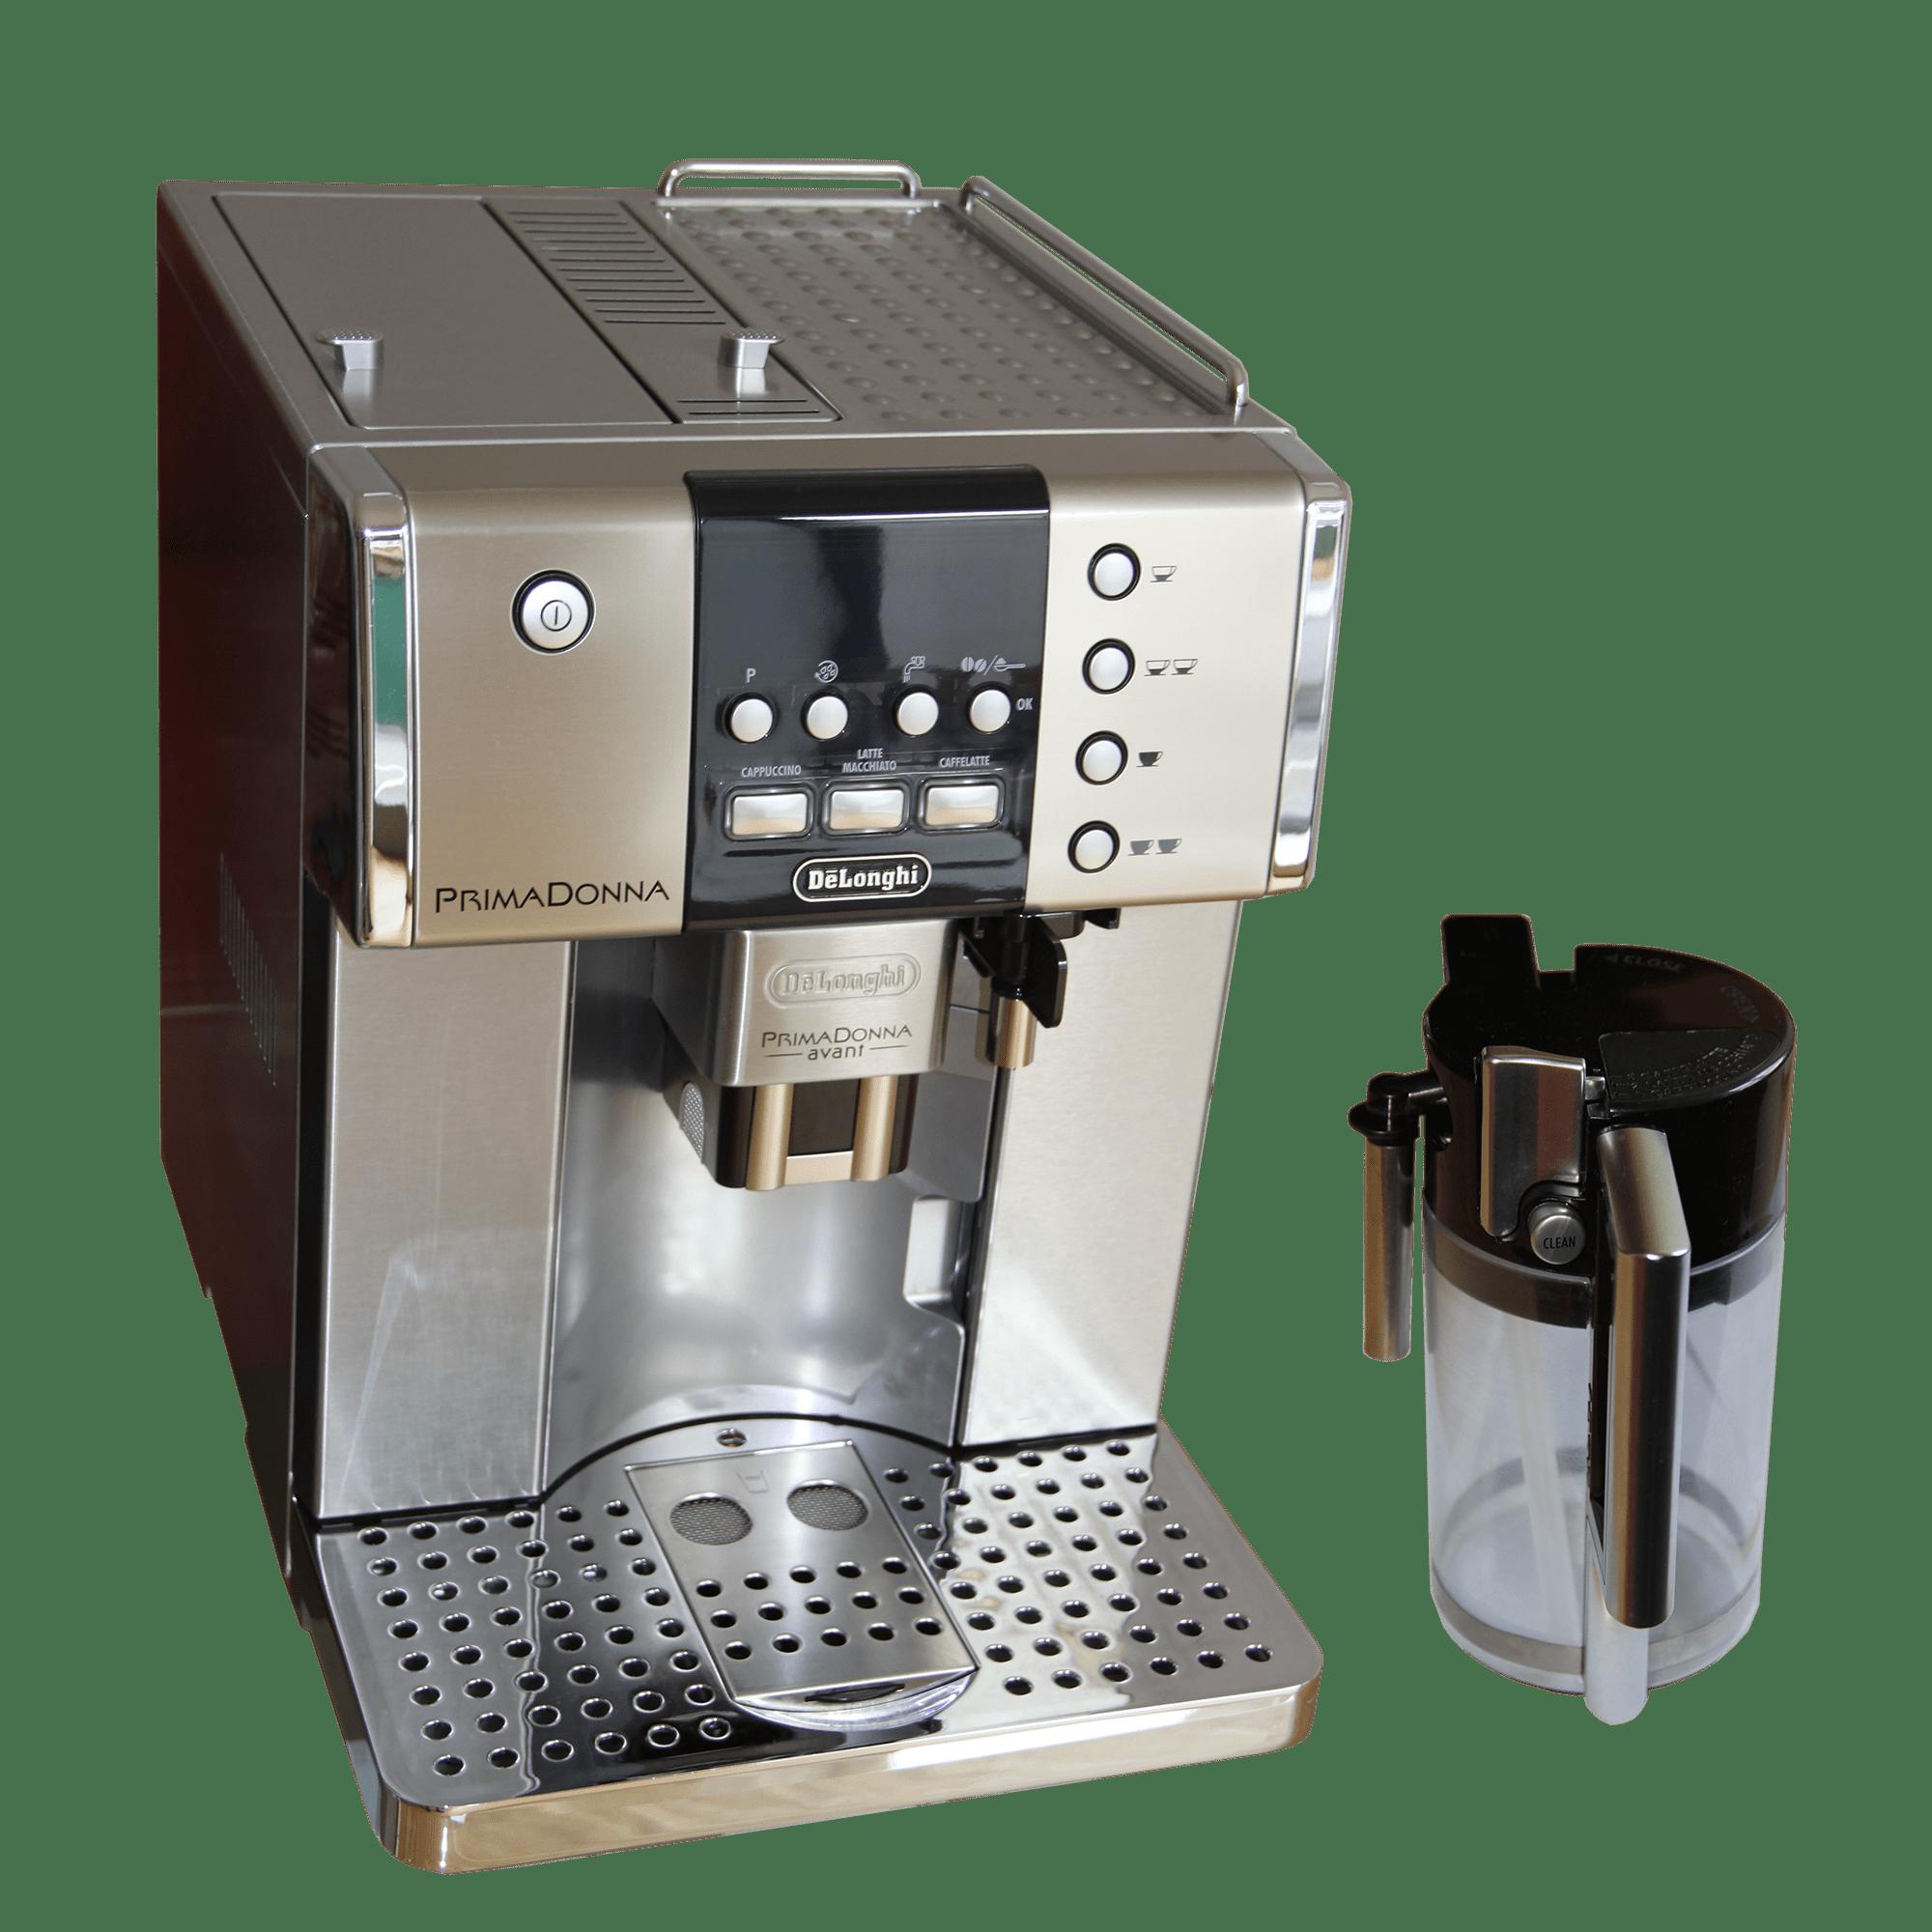 Delonghi_Primadonna_Avant_ESAM_6620_Kaffeevollautomat-min